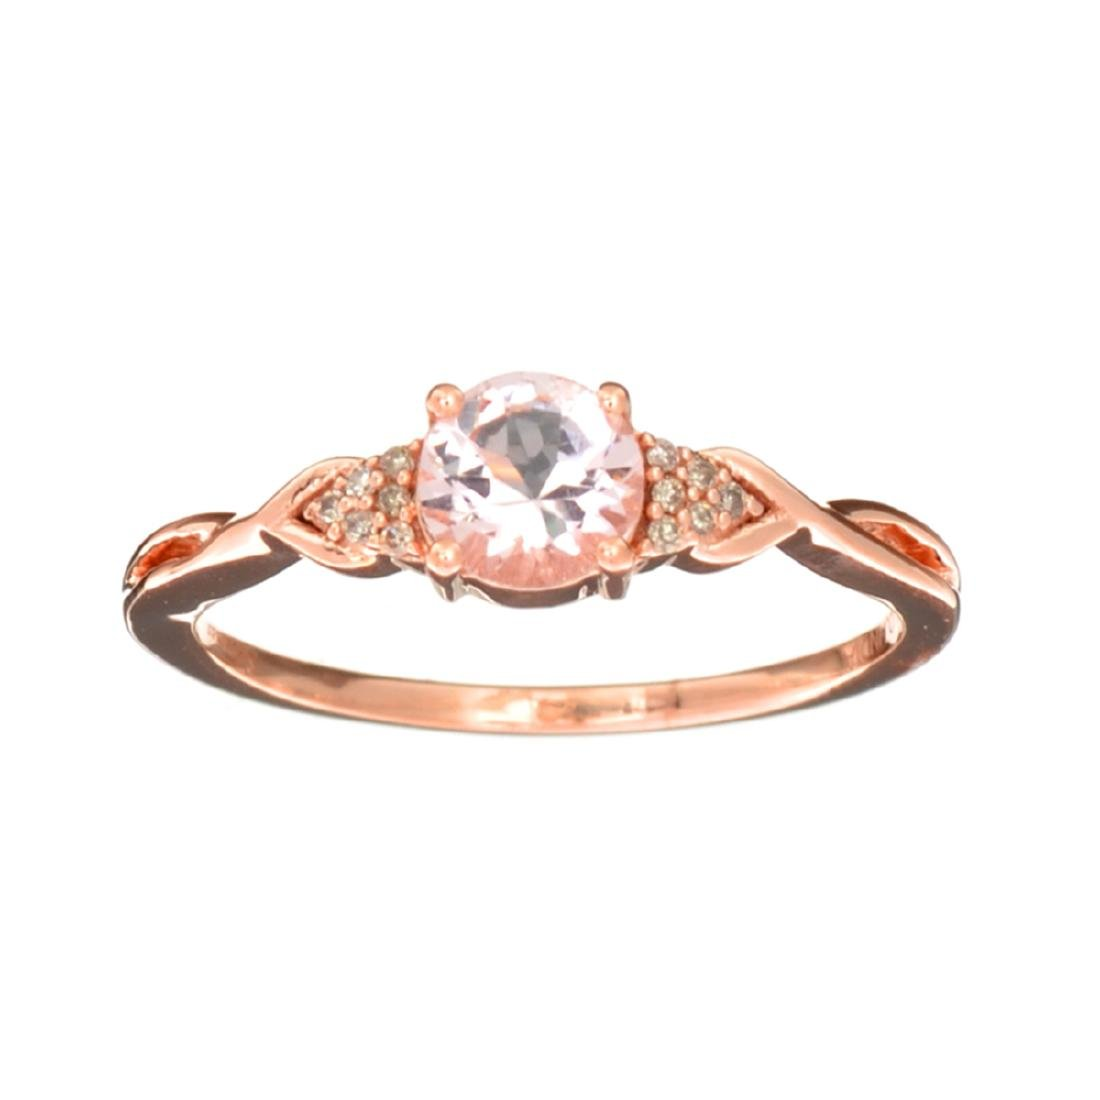 Designer Sebastian 14 KT Rose Gold, Round Cut Morganite